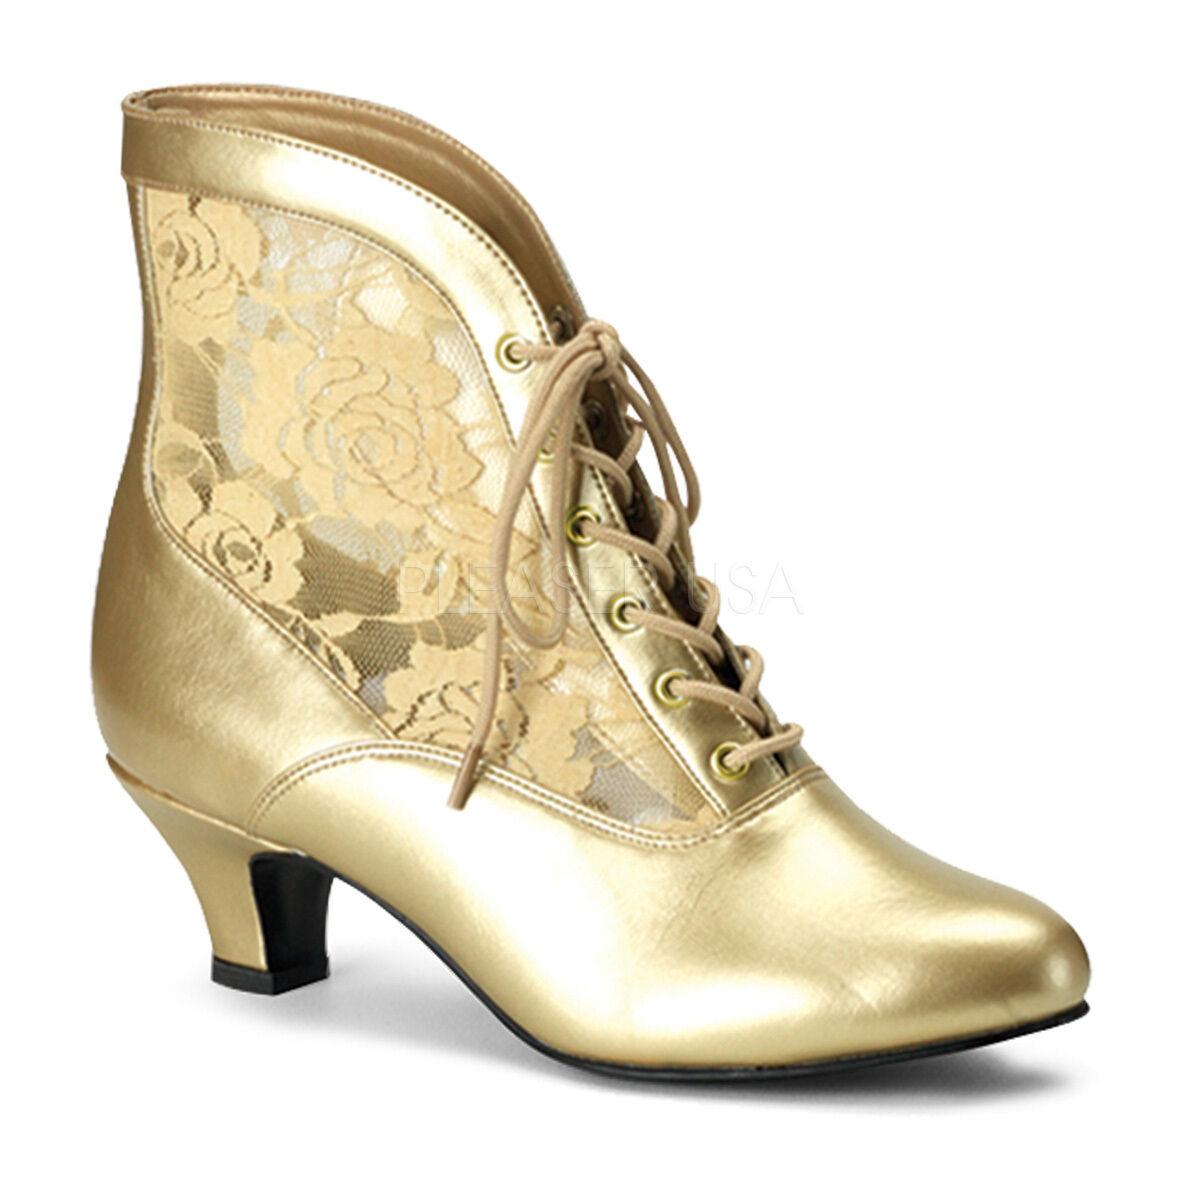 Or Victorian era période Marie Antoinette Reine Bottines Costume chaussures